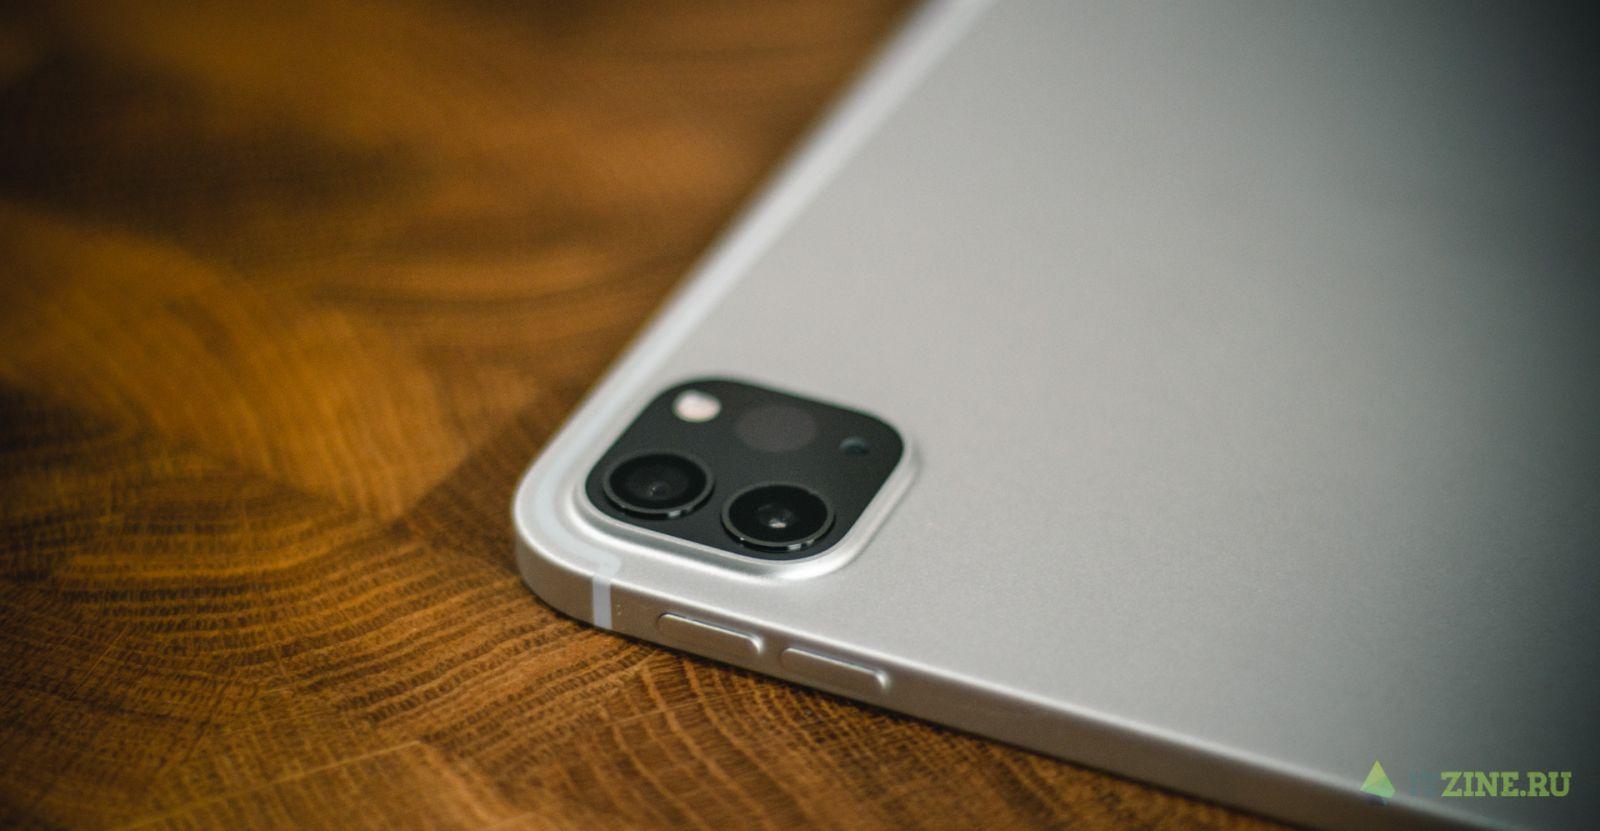 Дизайнерский рай. Обзор Apple iPad Pro 2020 + Apple Pencil + Magic Keyboard (dsc 8908)